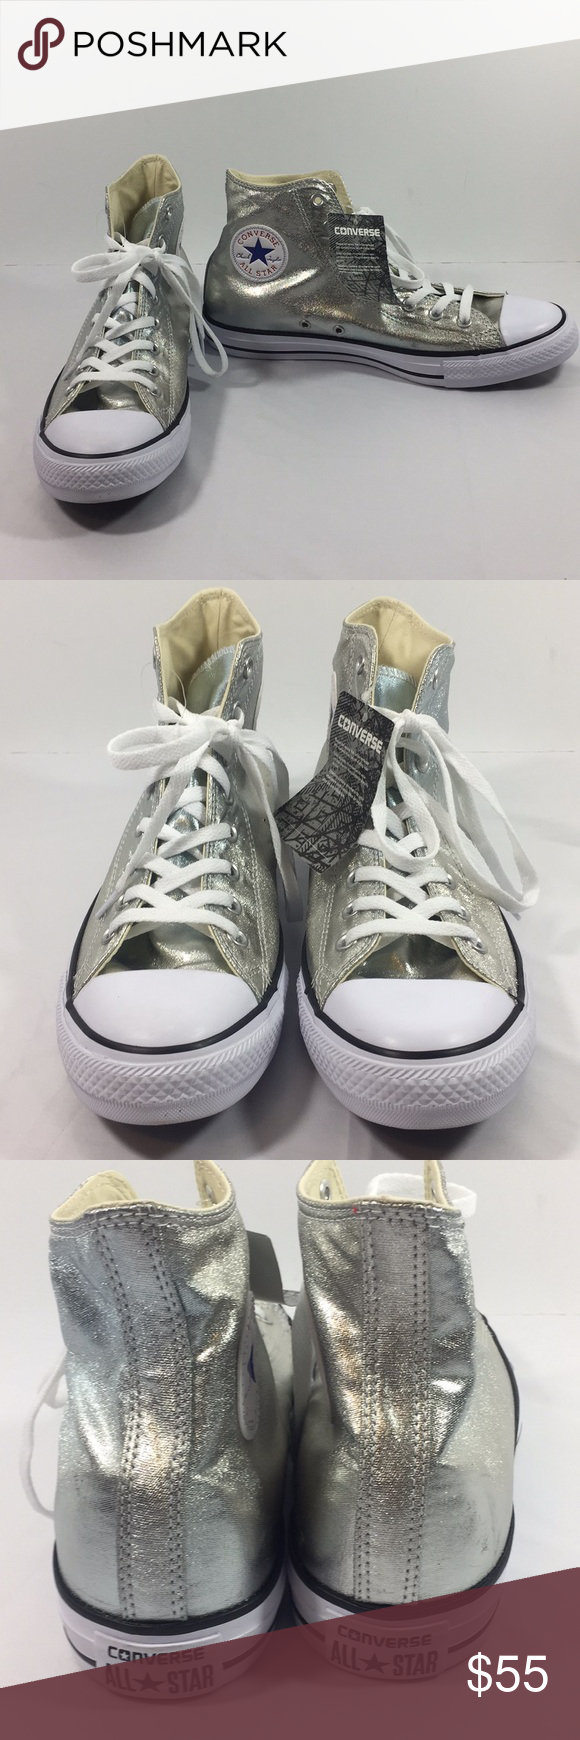 silver Converse high tops NWT Converse